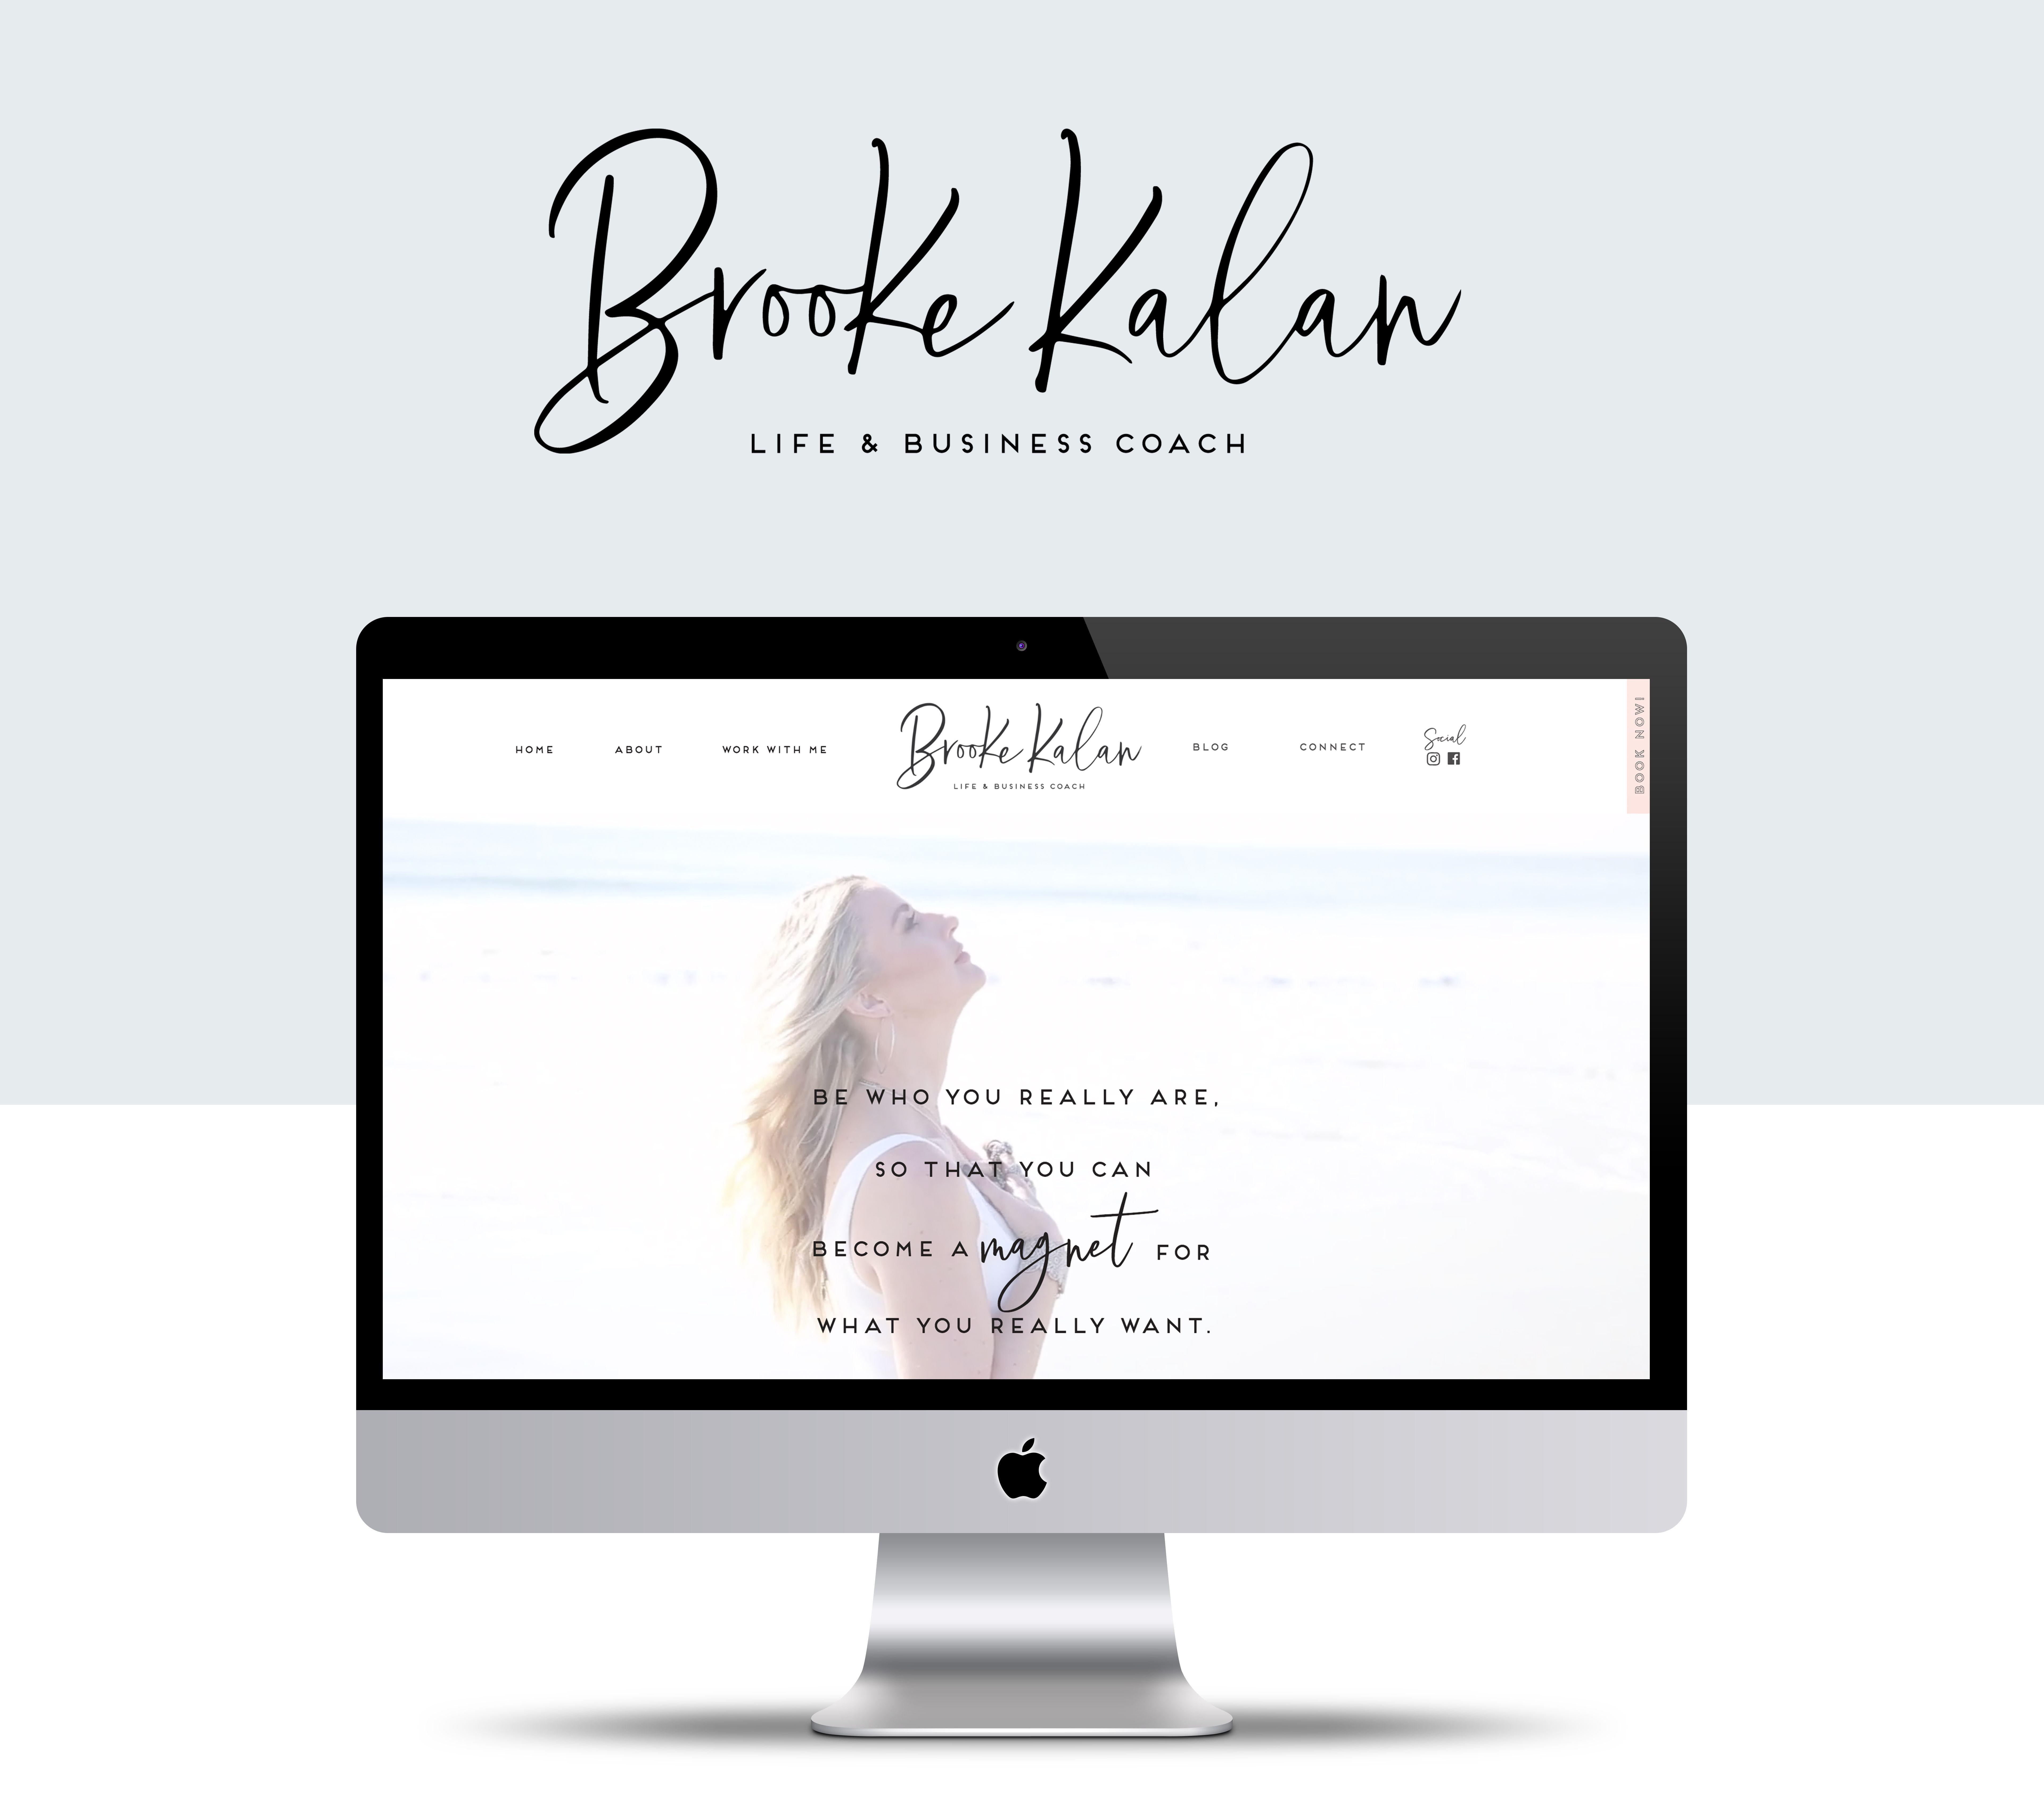 beachy life coach showit website design the best of. Black Bedroom Furniture Sets. Home Design Ideas